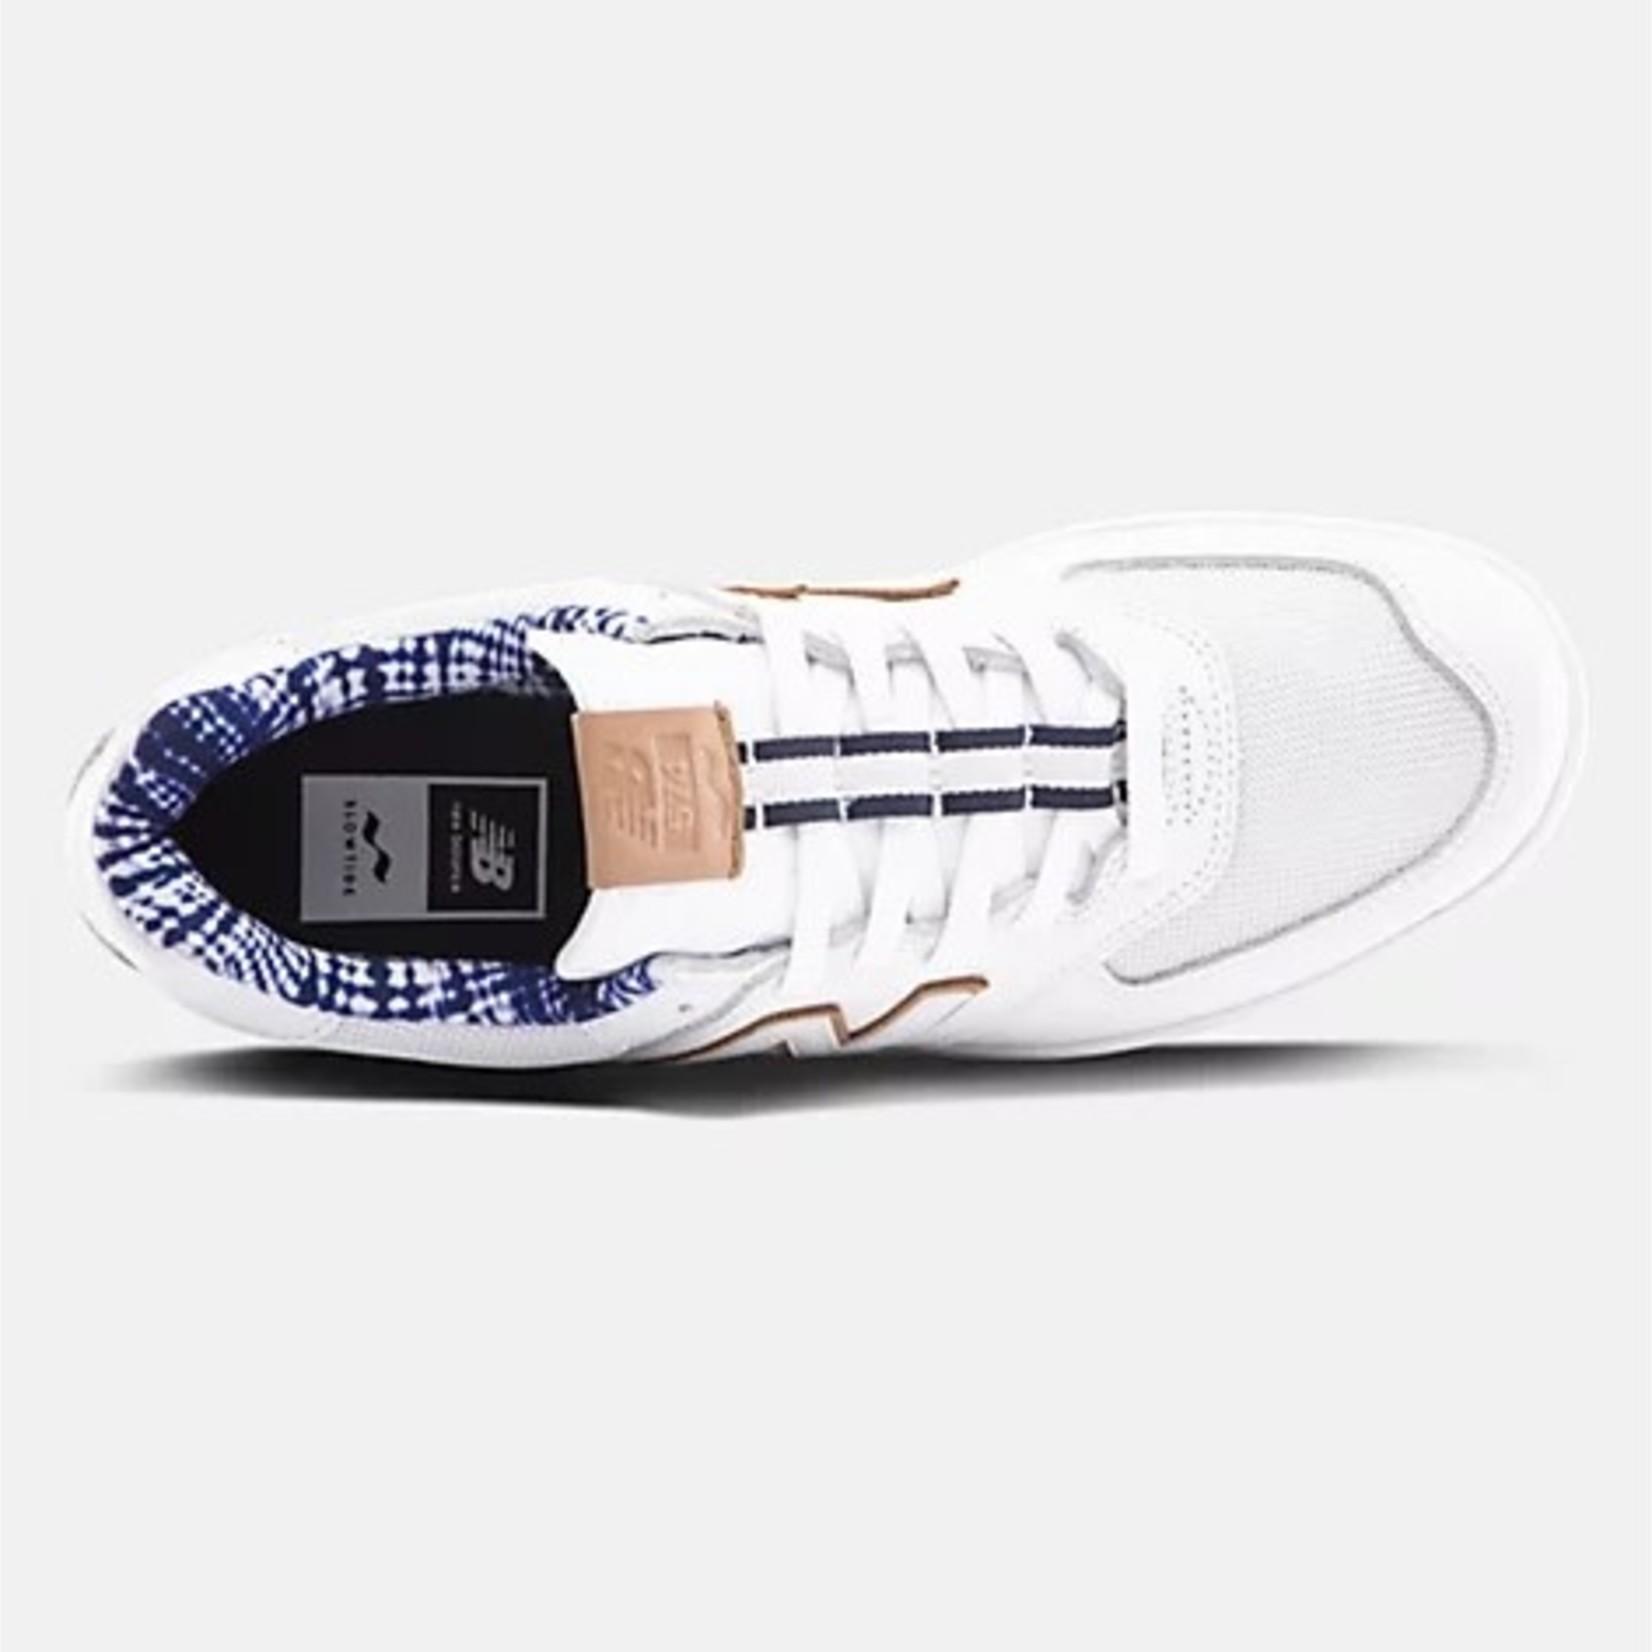 New Balance New Balance 574 x Slowtide Sneakers